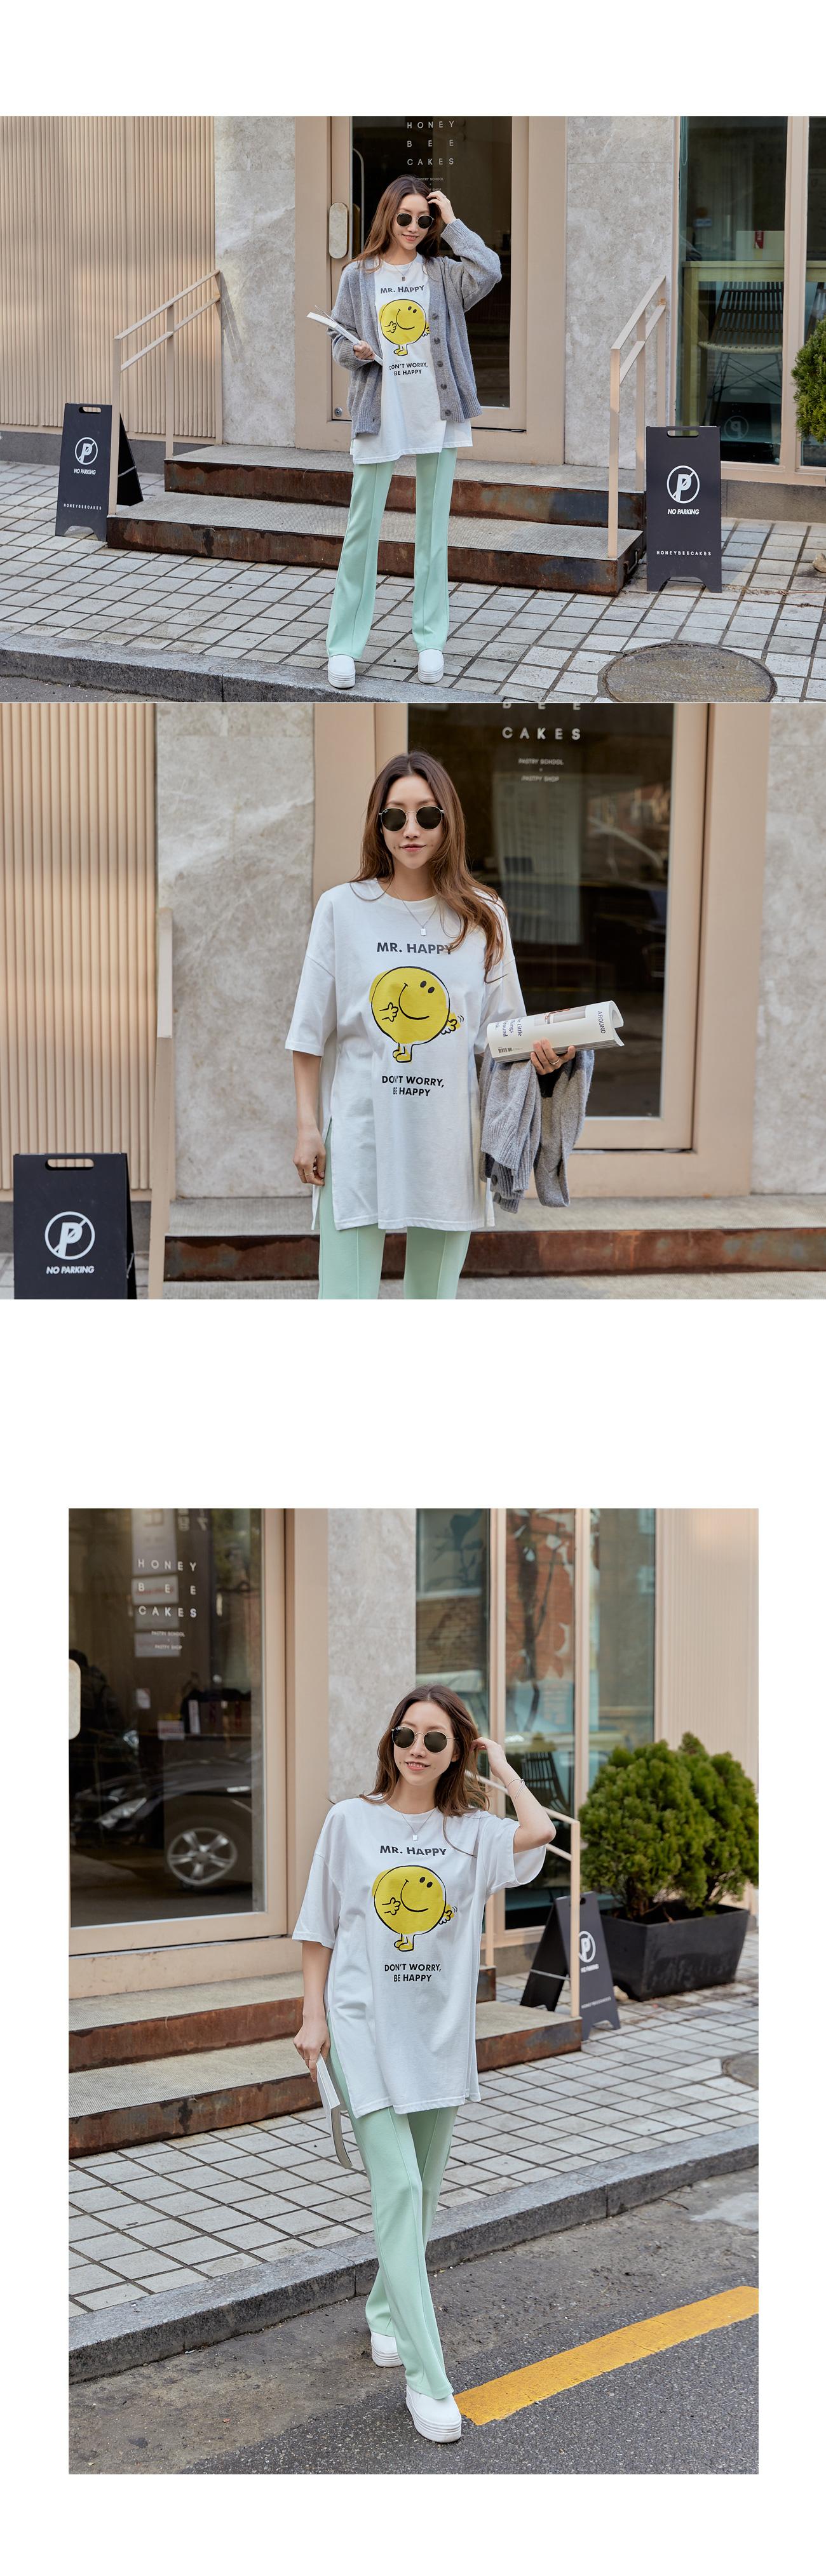 Smile Loose-fit Fit Slit Long T-shirt #108854